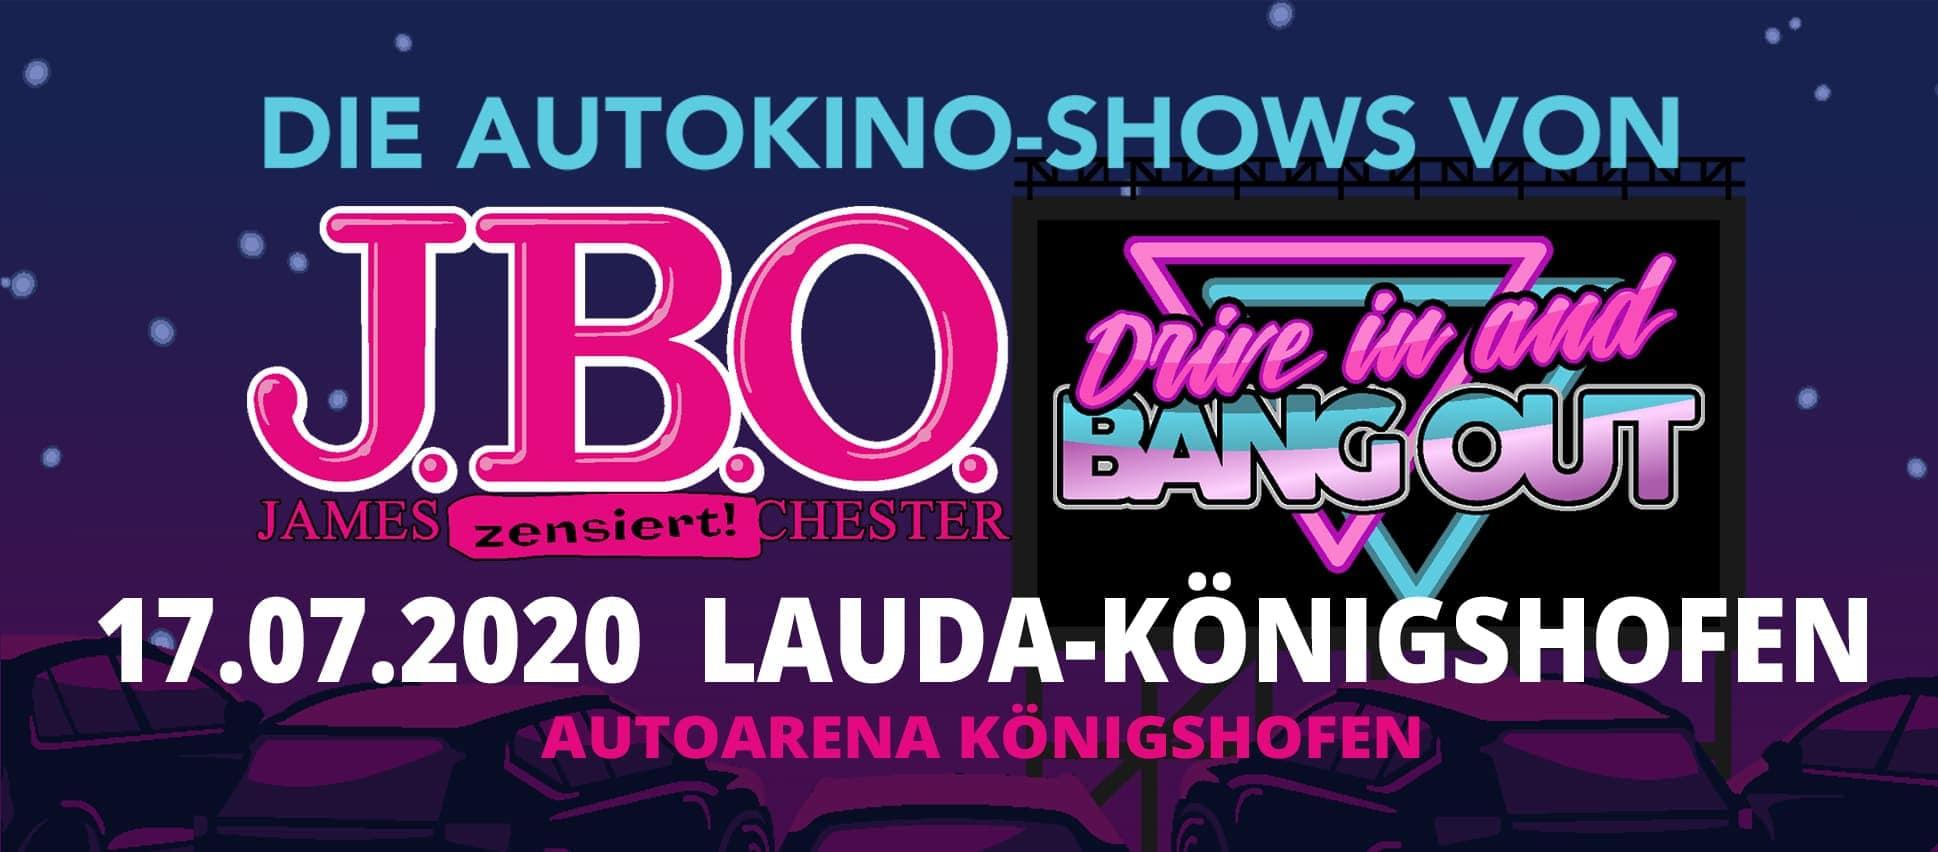 Drive in and Bang out: Freitag, 17. Juli 2020 - Autoarena Königshofen, Lauda-Königshofen